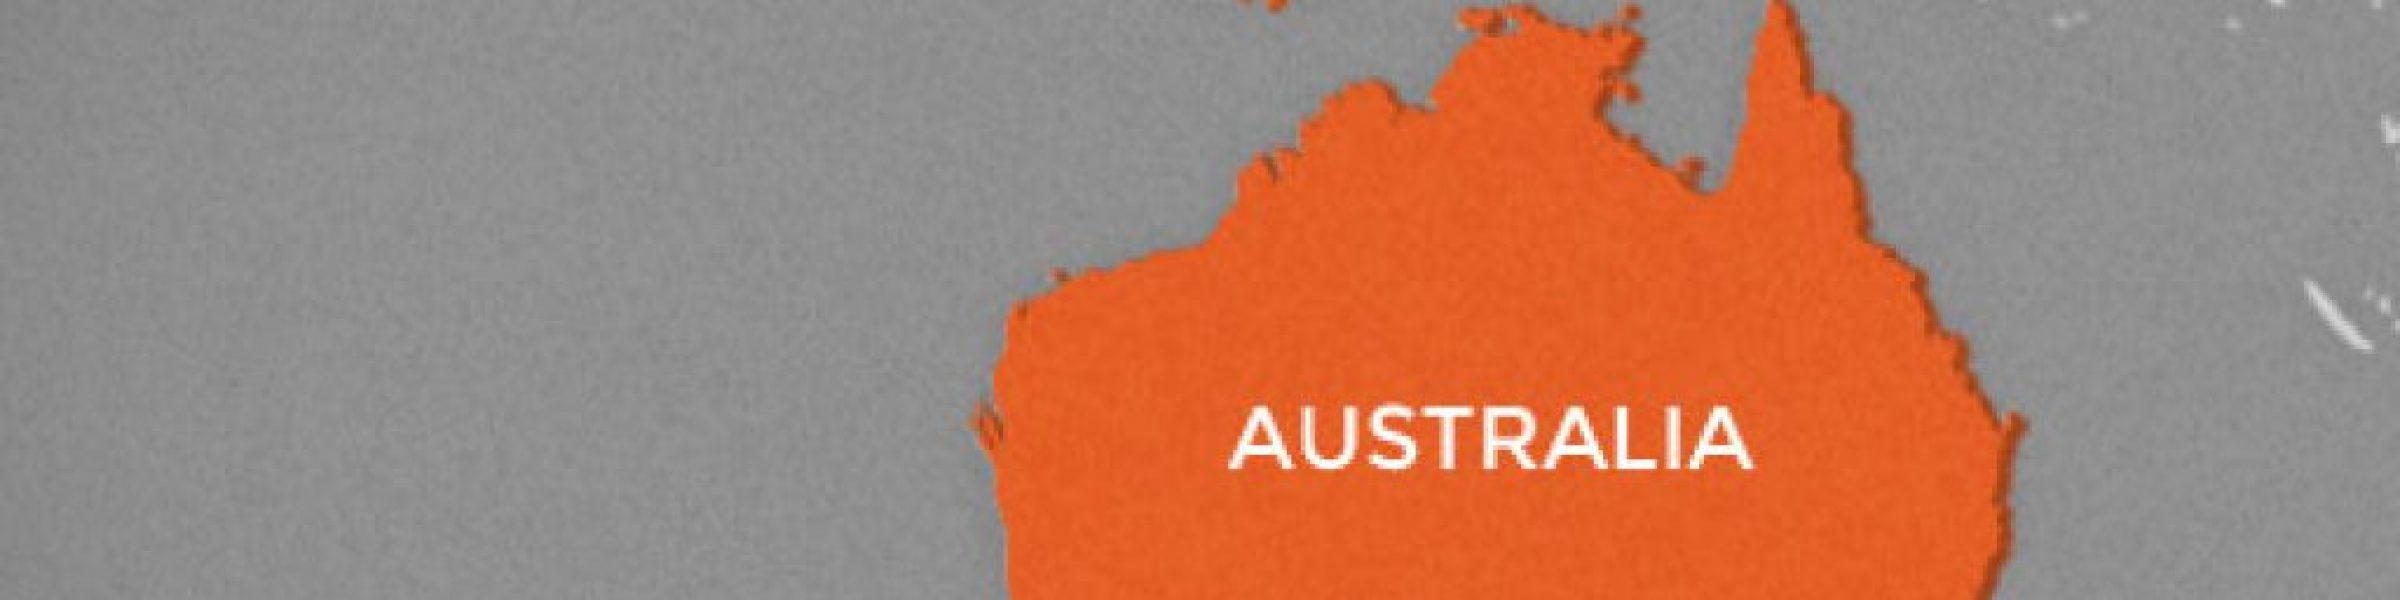 australia indonesia business council